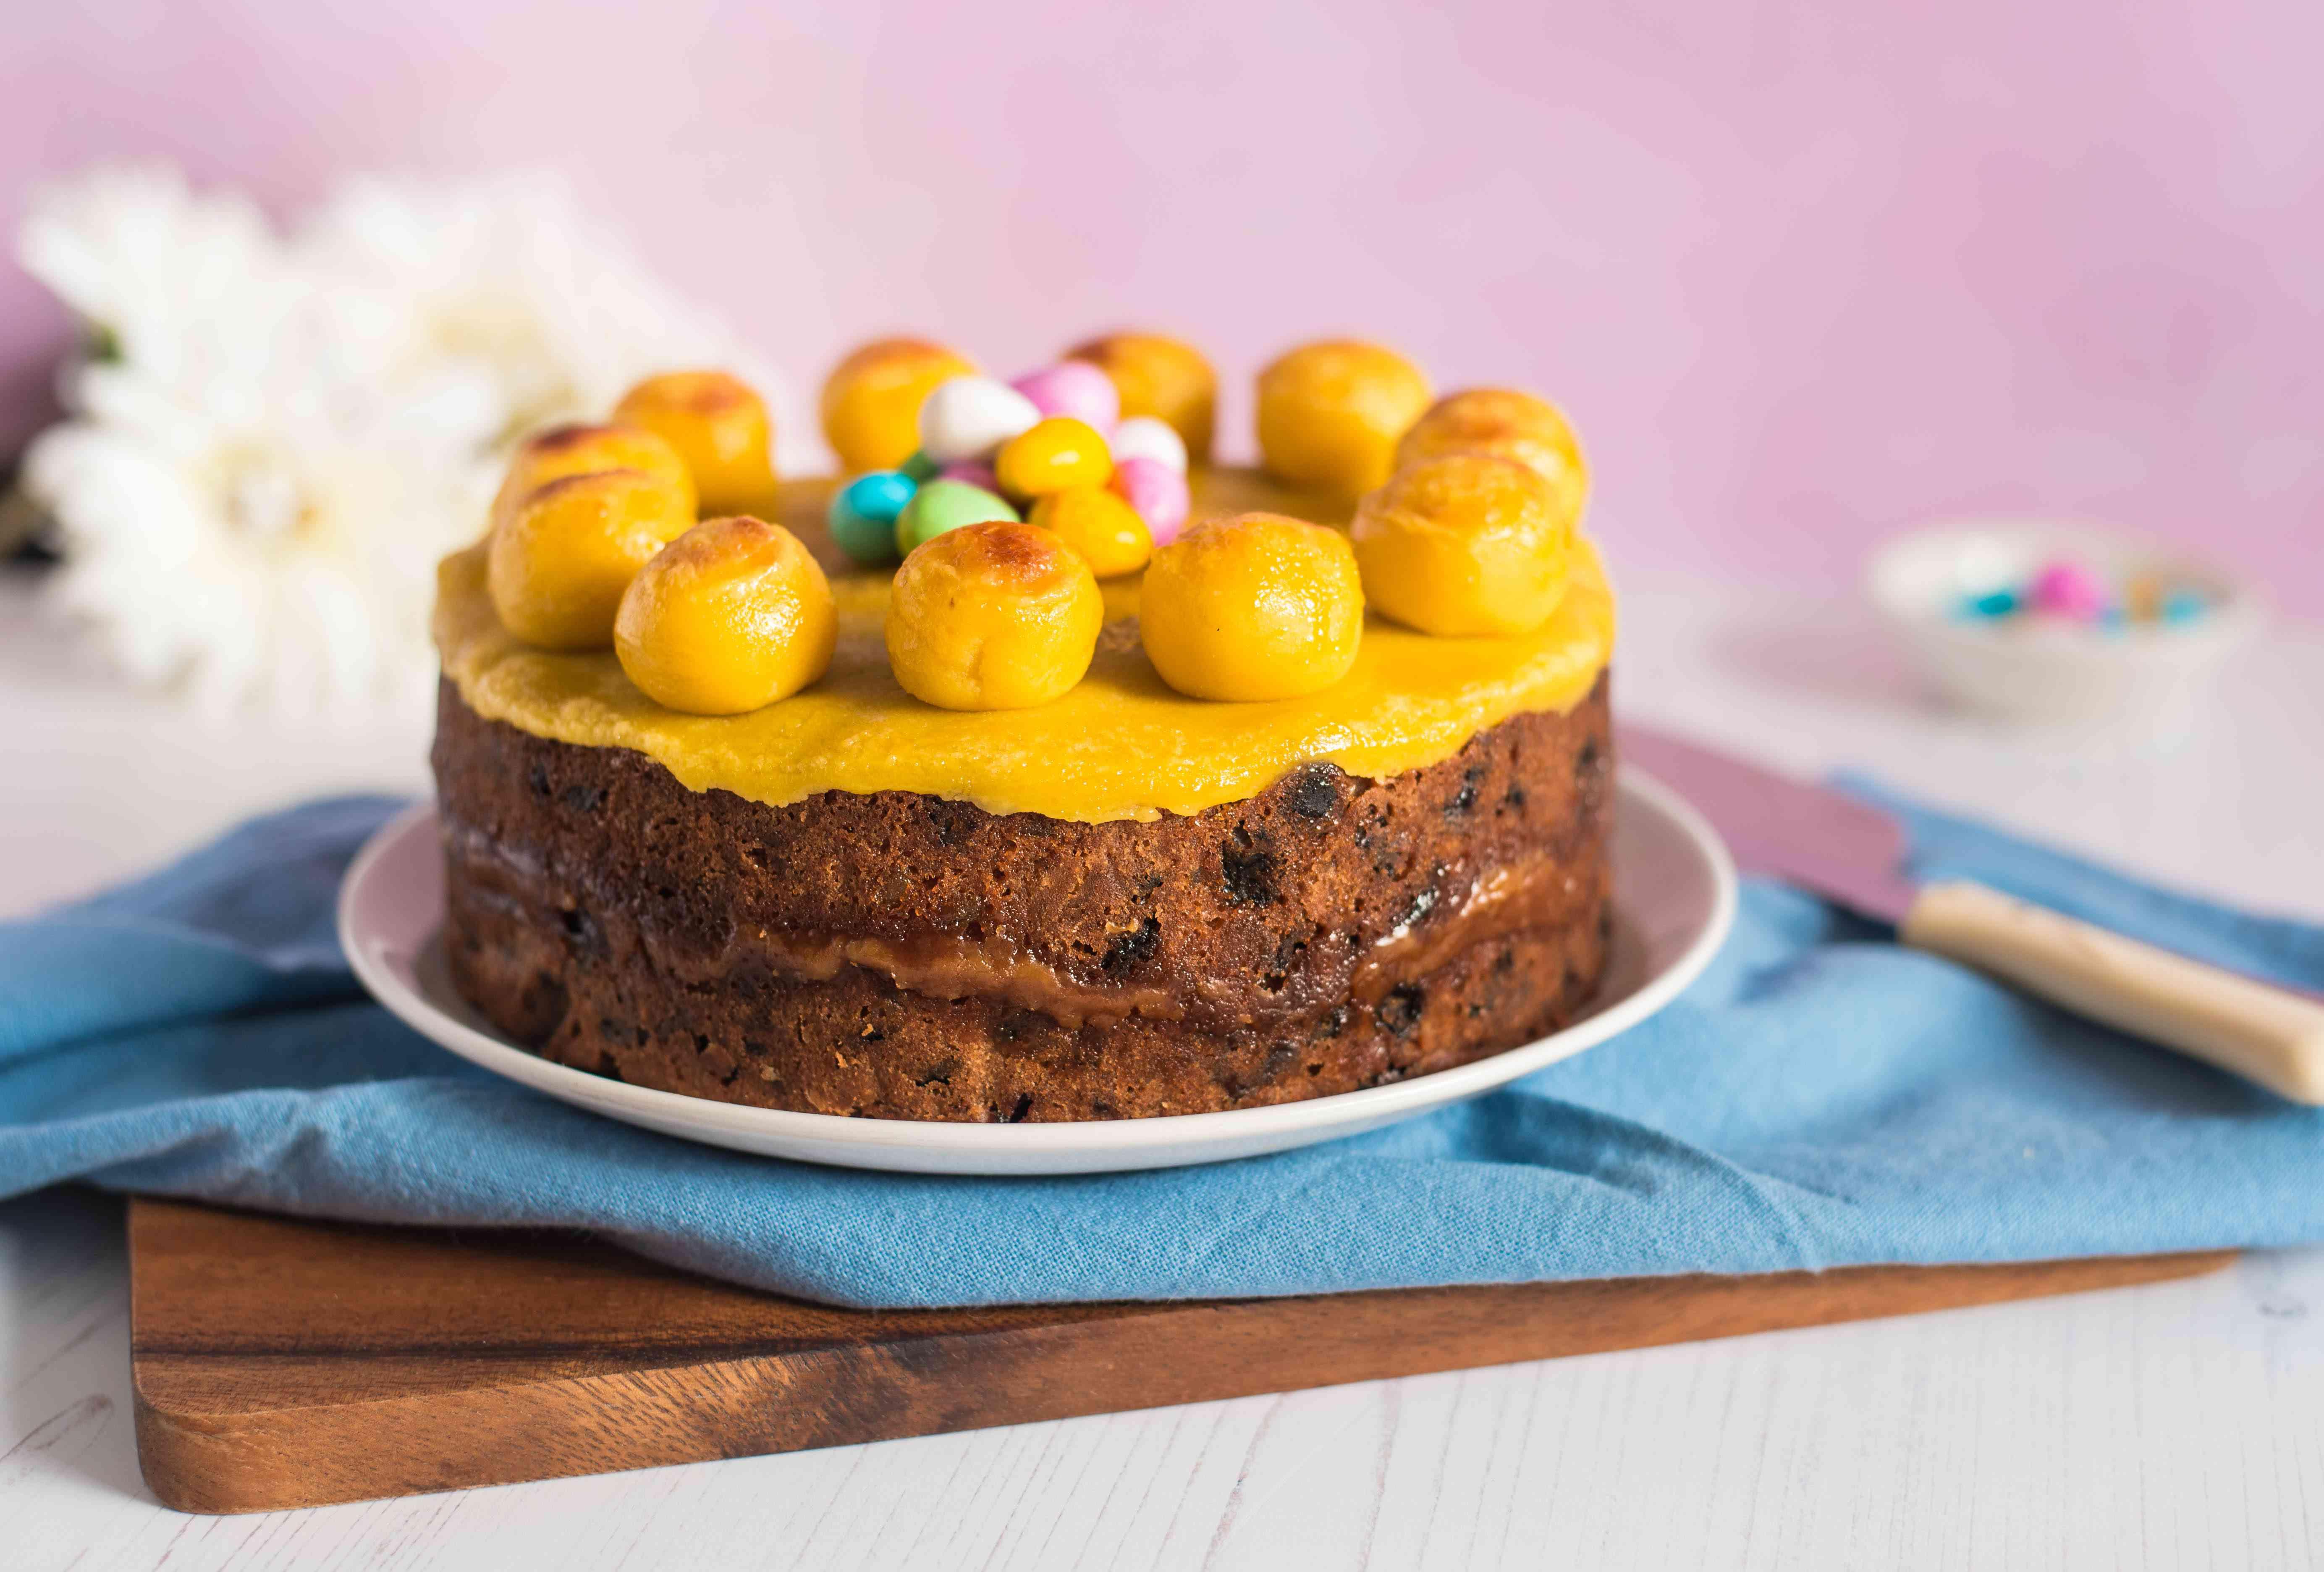 Simple simnel cake